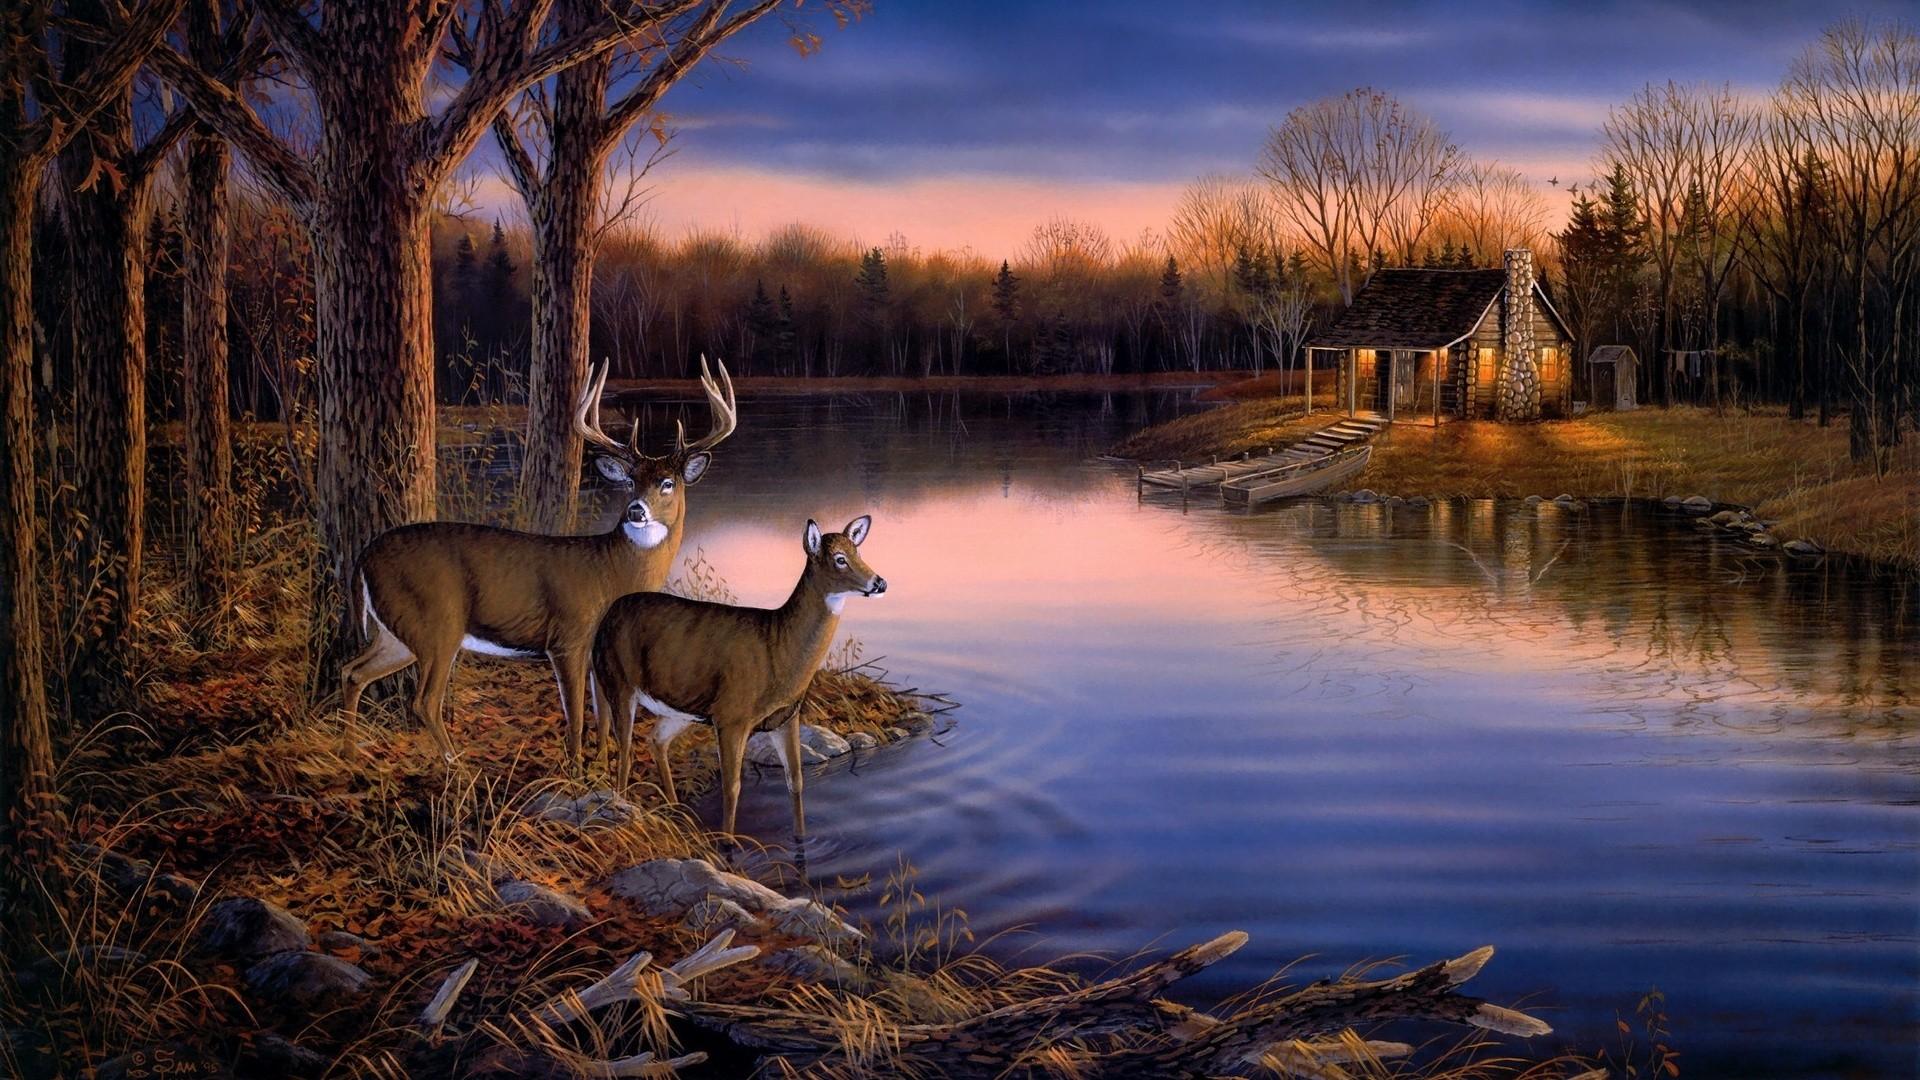 Explore Deer Wallpaper, Wallpaper Pictures, and more!